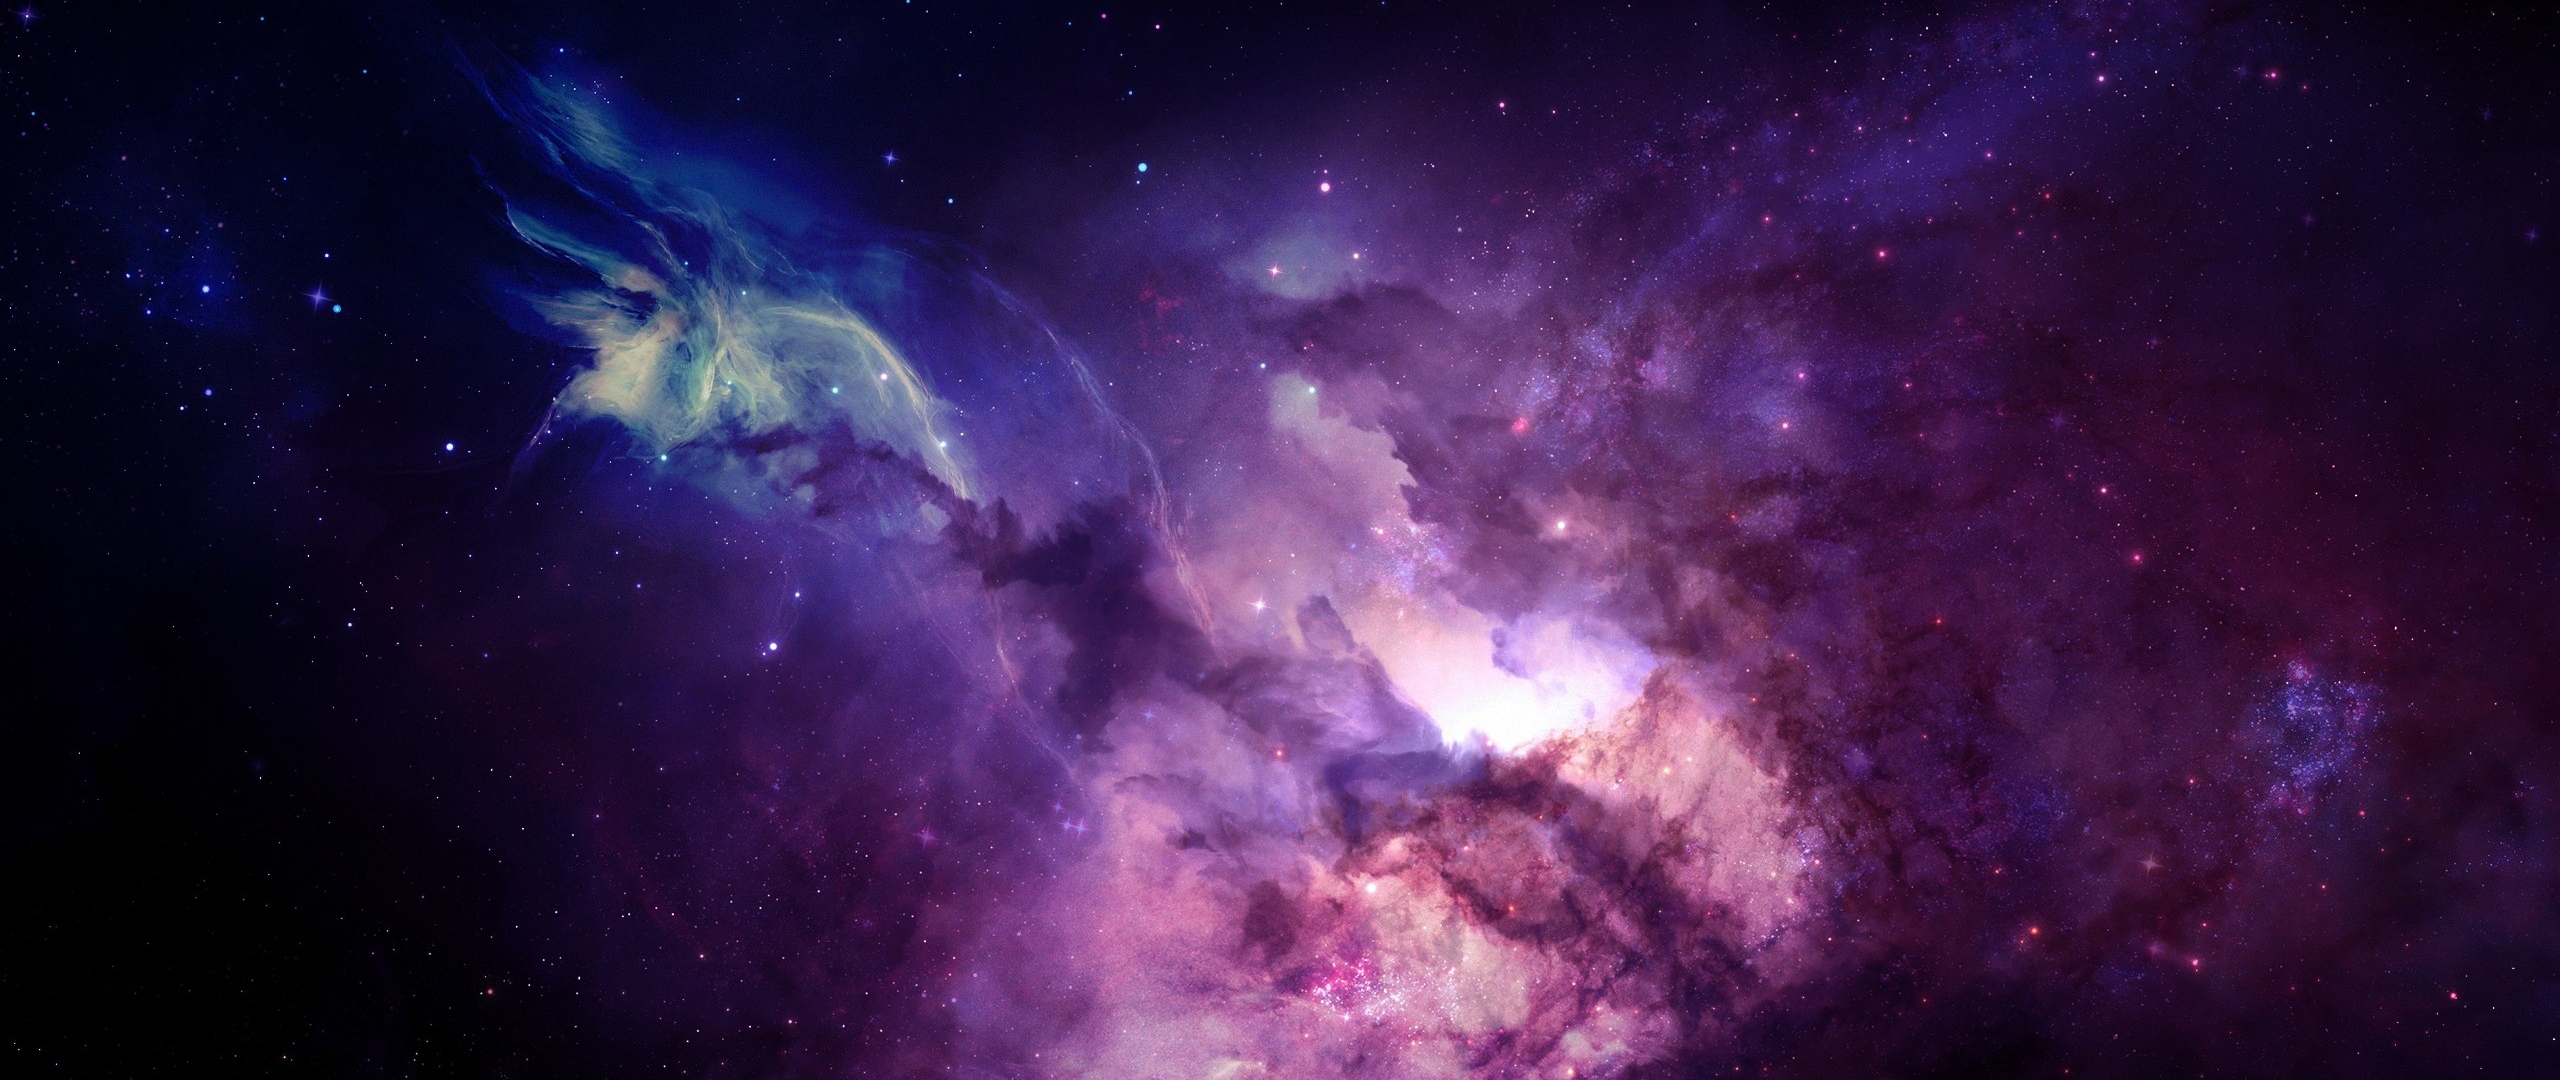 Wallpaper 2560x1080 space flight sky shadow 2560x1080 219 TV HD 2560x1080